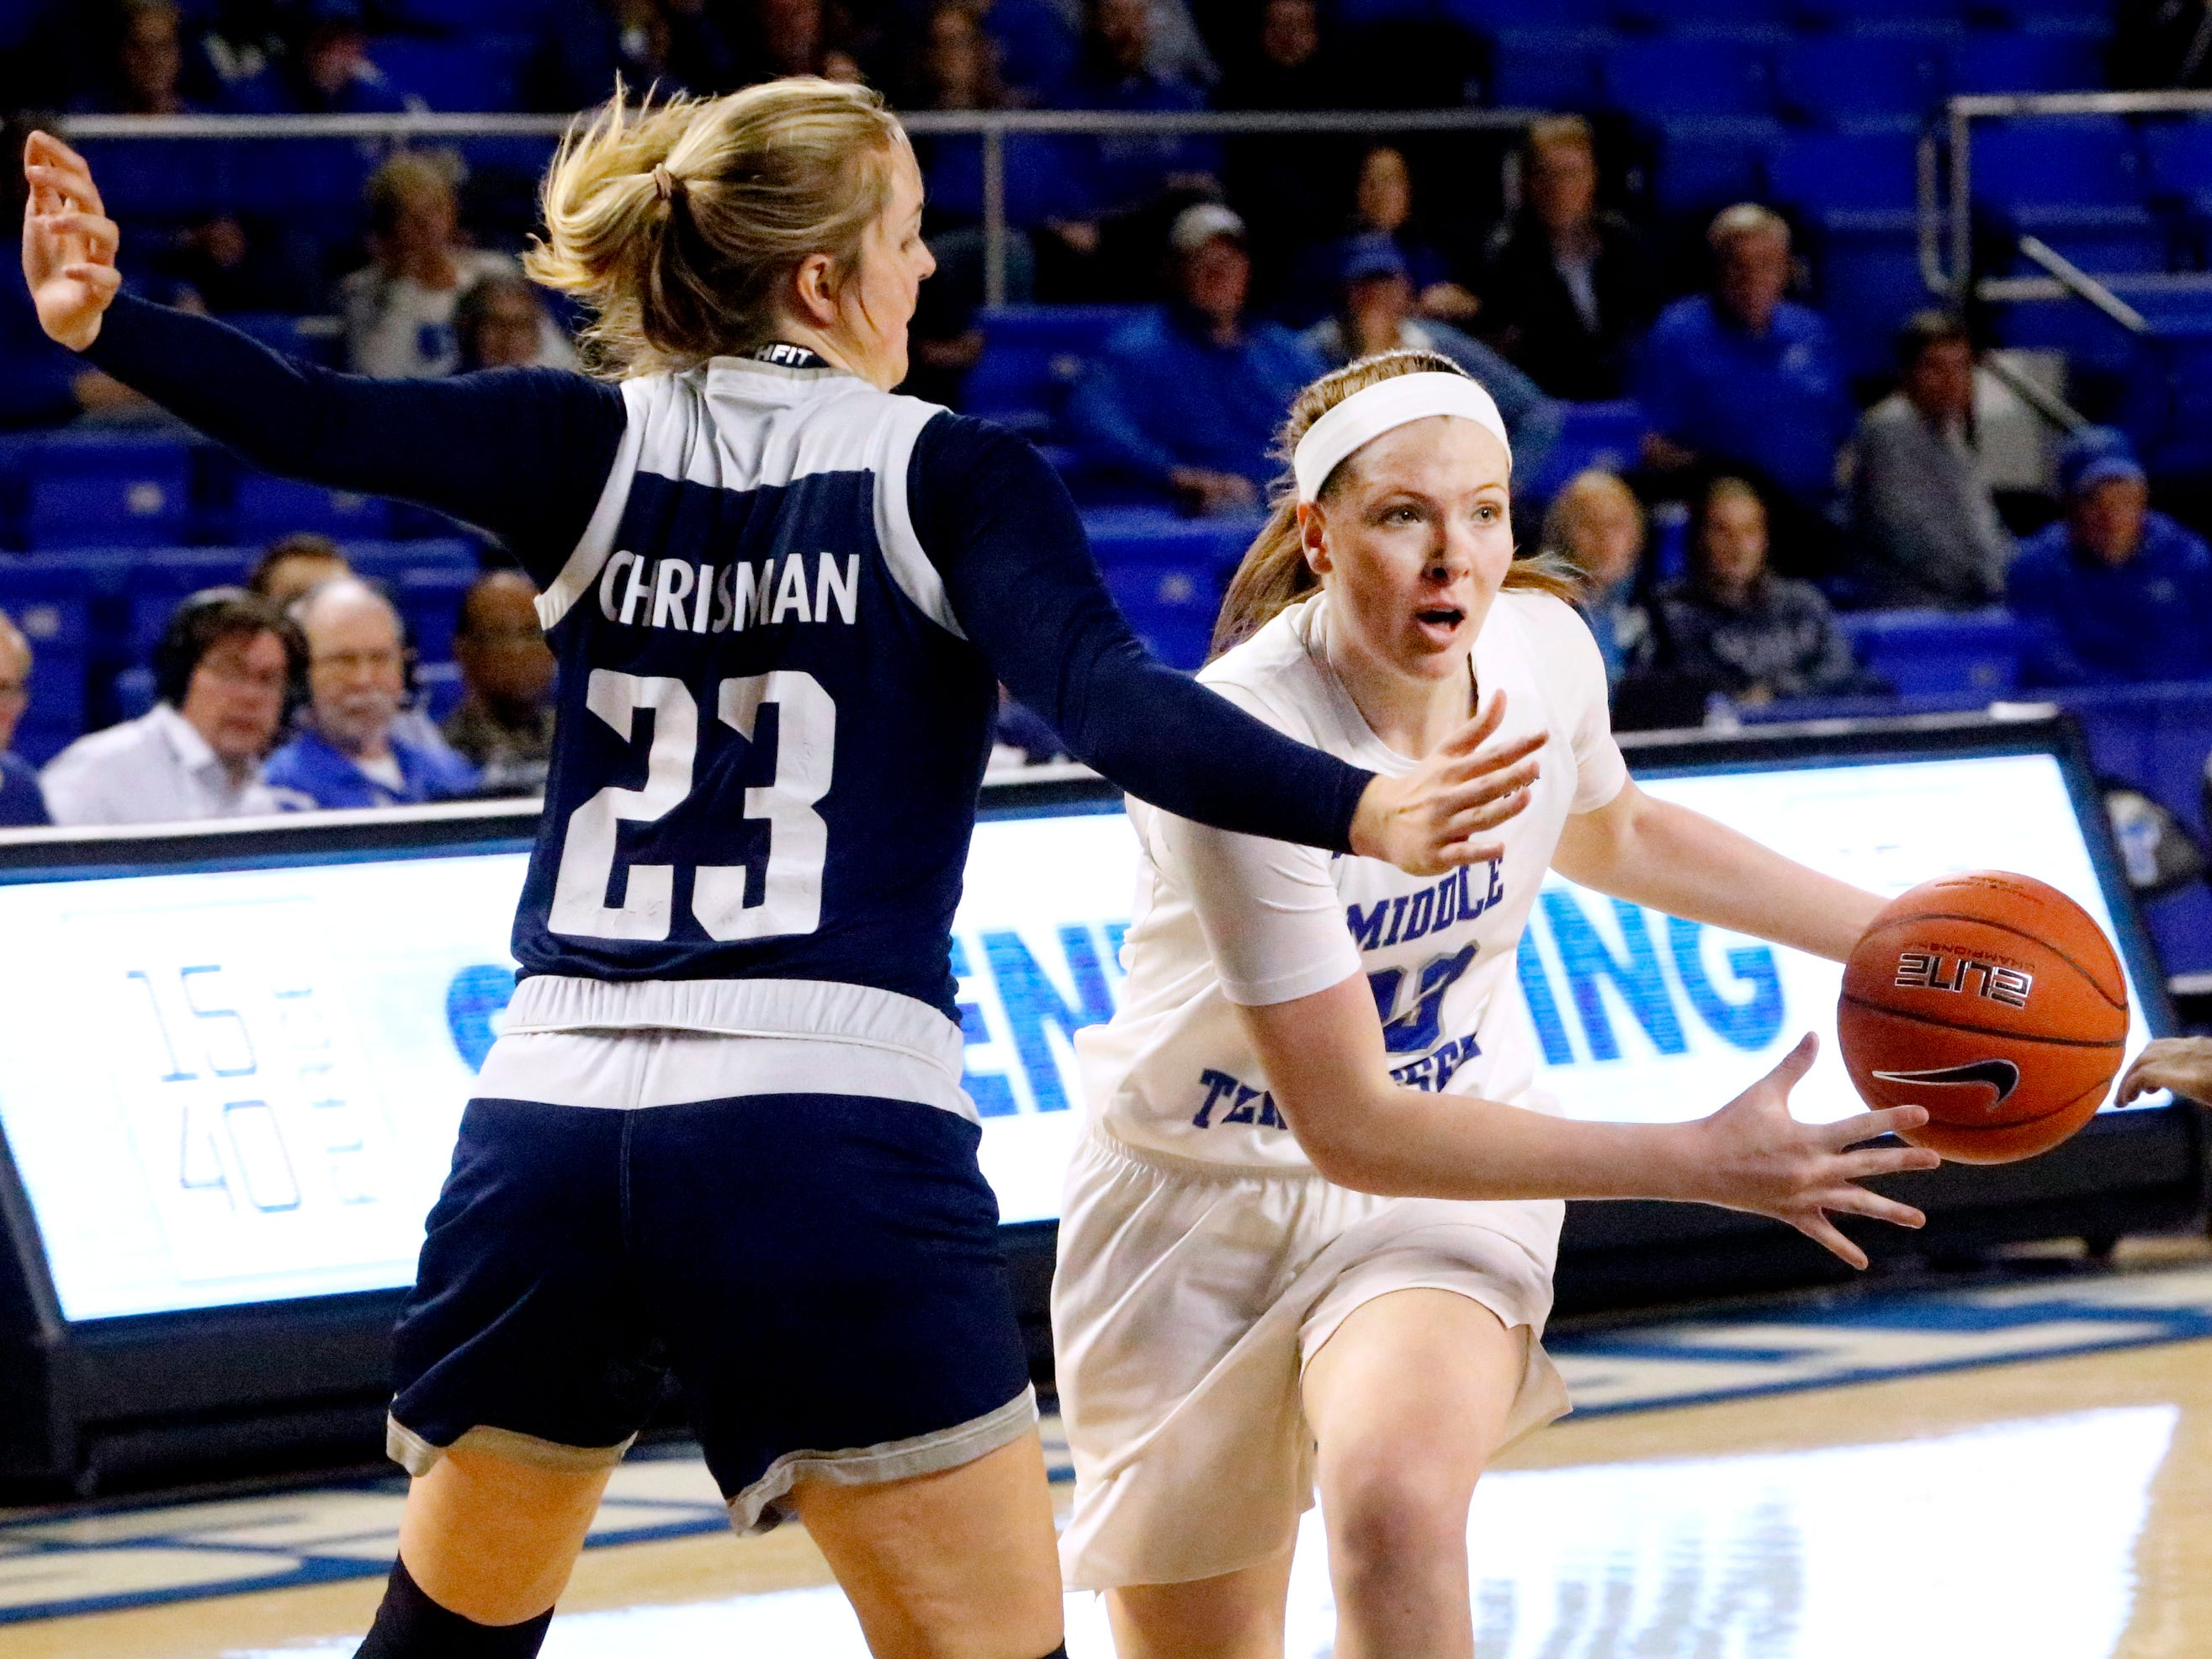 MTSU's guard Alexis Whittington (23) drives to the basket as Rice's center Alexah Chrisman (23) guards her on Thursday Jan. 24, 2019.